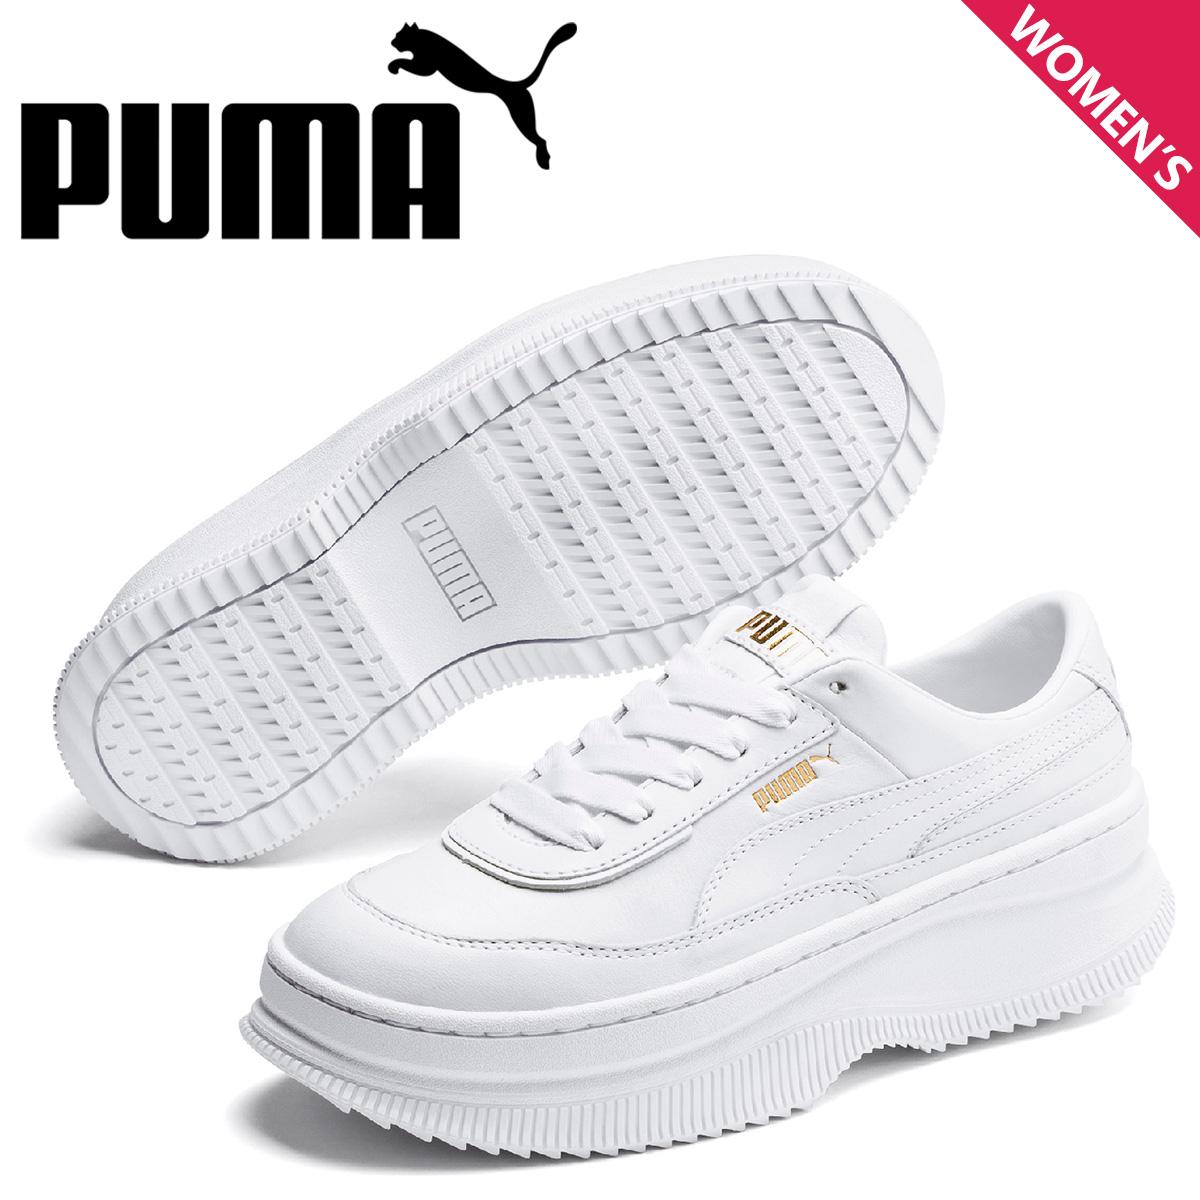 PUMA プーマ デバ スニーカー レディース 厚底 DEVA ホワイト 白 37119903 [予約 5月上旬 新入荷予定]